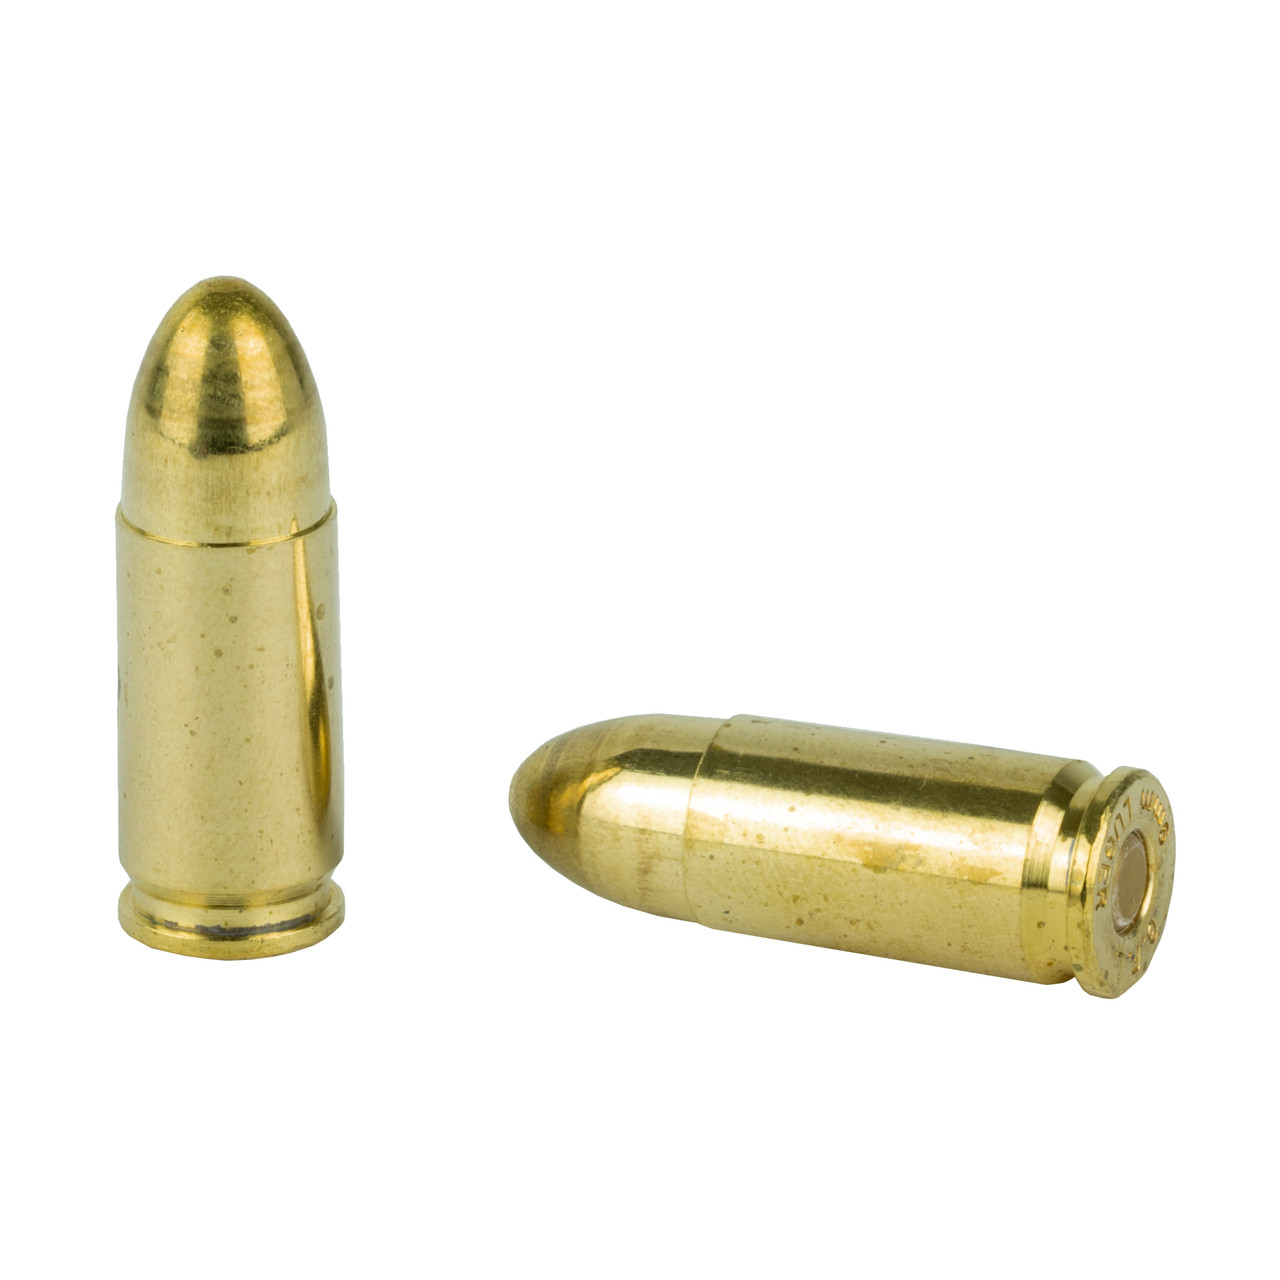 9mm 115gr FMJ